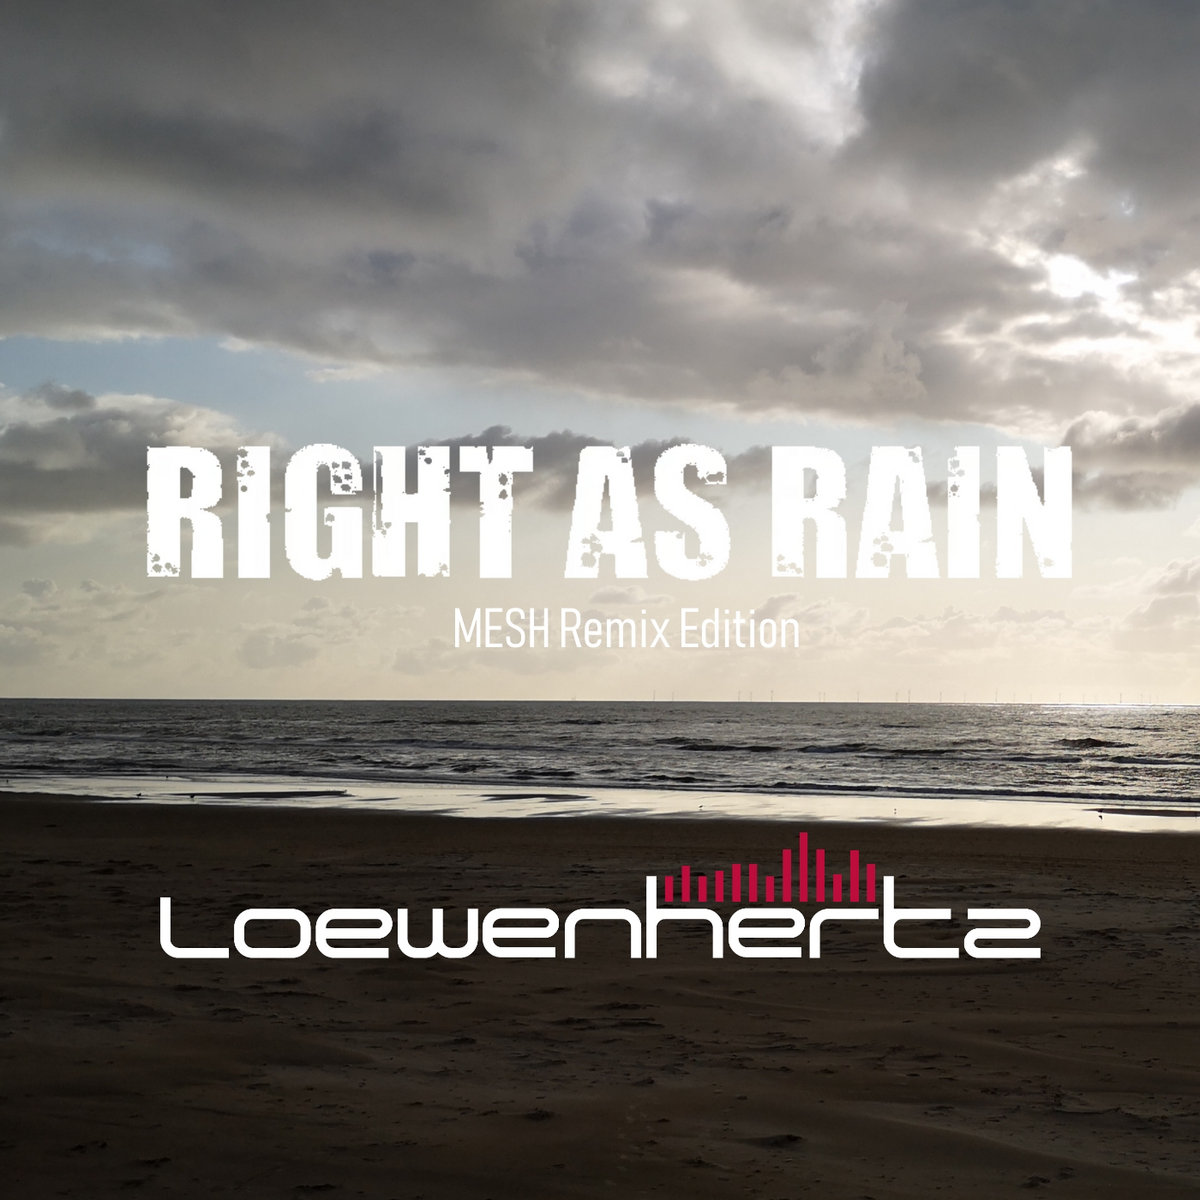 Electro News @ – Loewenhertz – Right As Rain (Mesh Remix Edition)